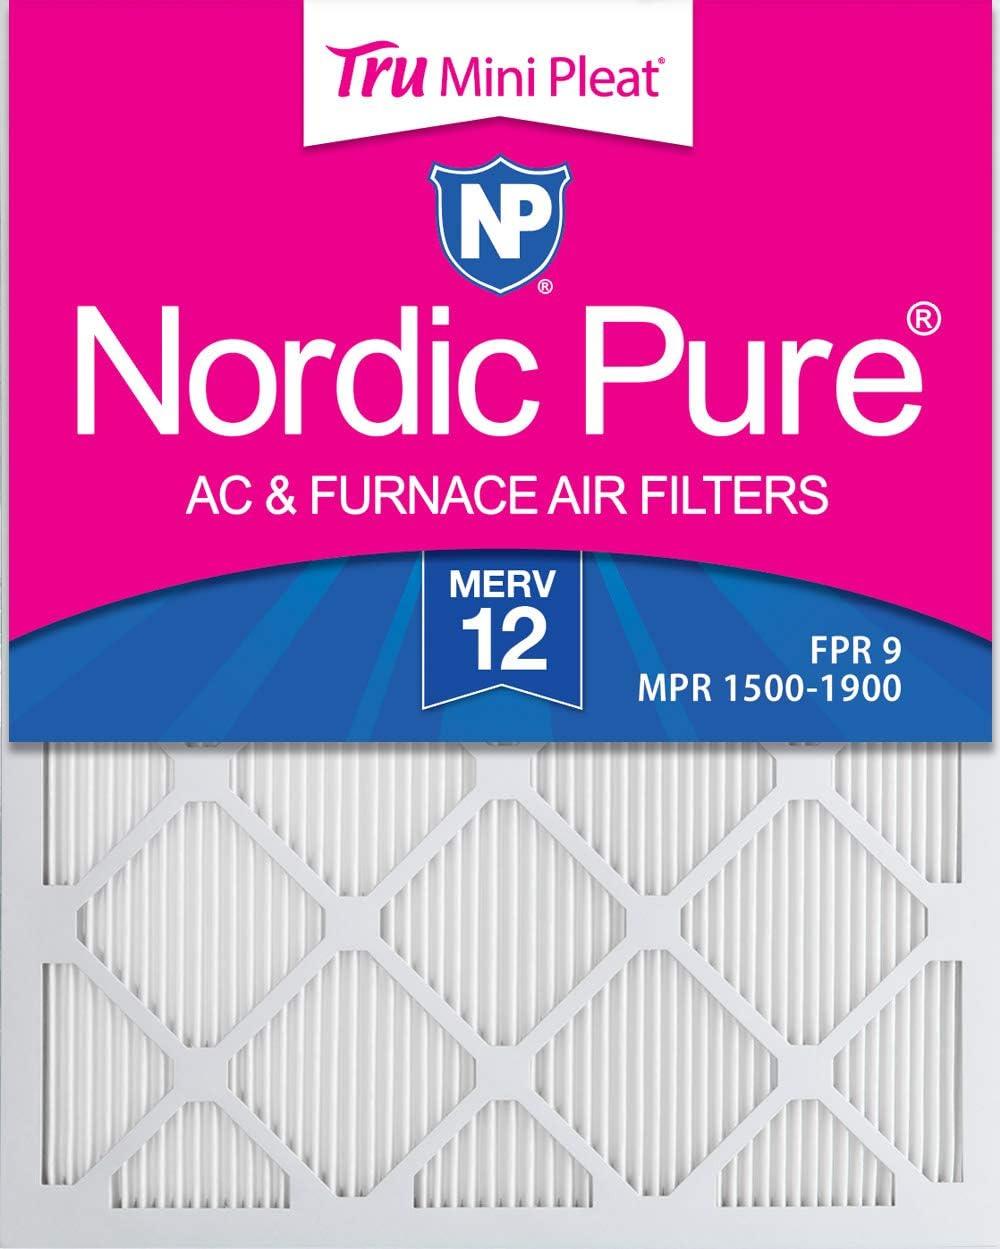 Nordic Pure 12x36x1 Exact MERV 13 Tru Mini Pleat AC Furnace Air Filters 1 Pack